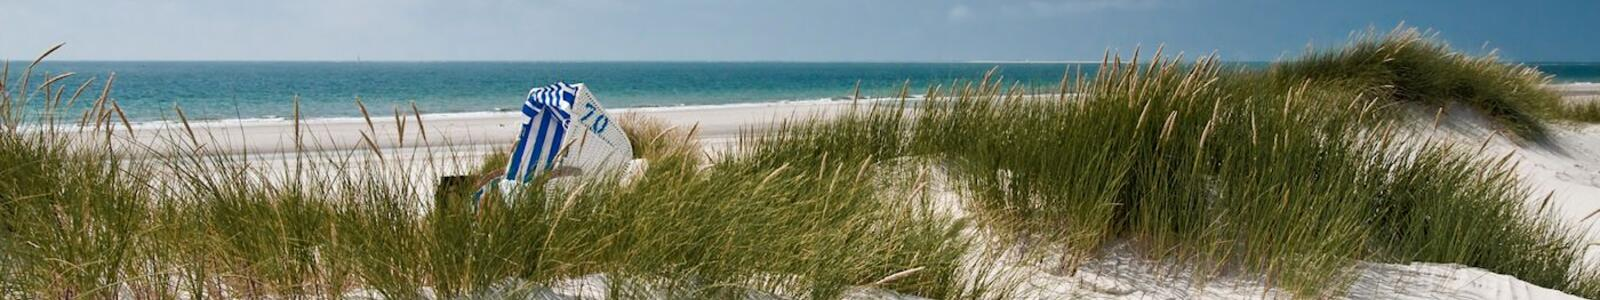 sylt nordsee strand strandkorb